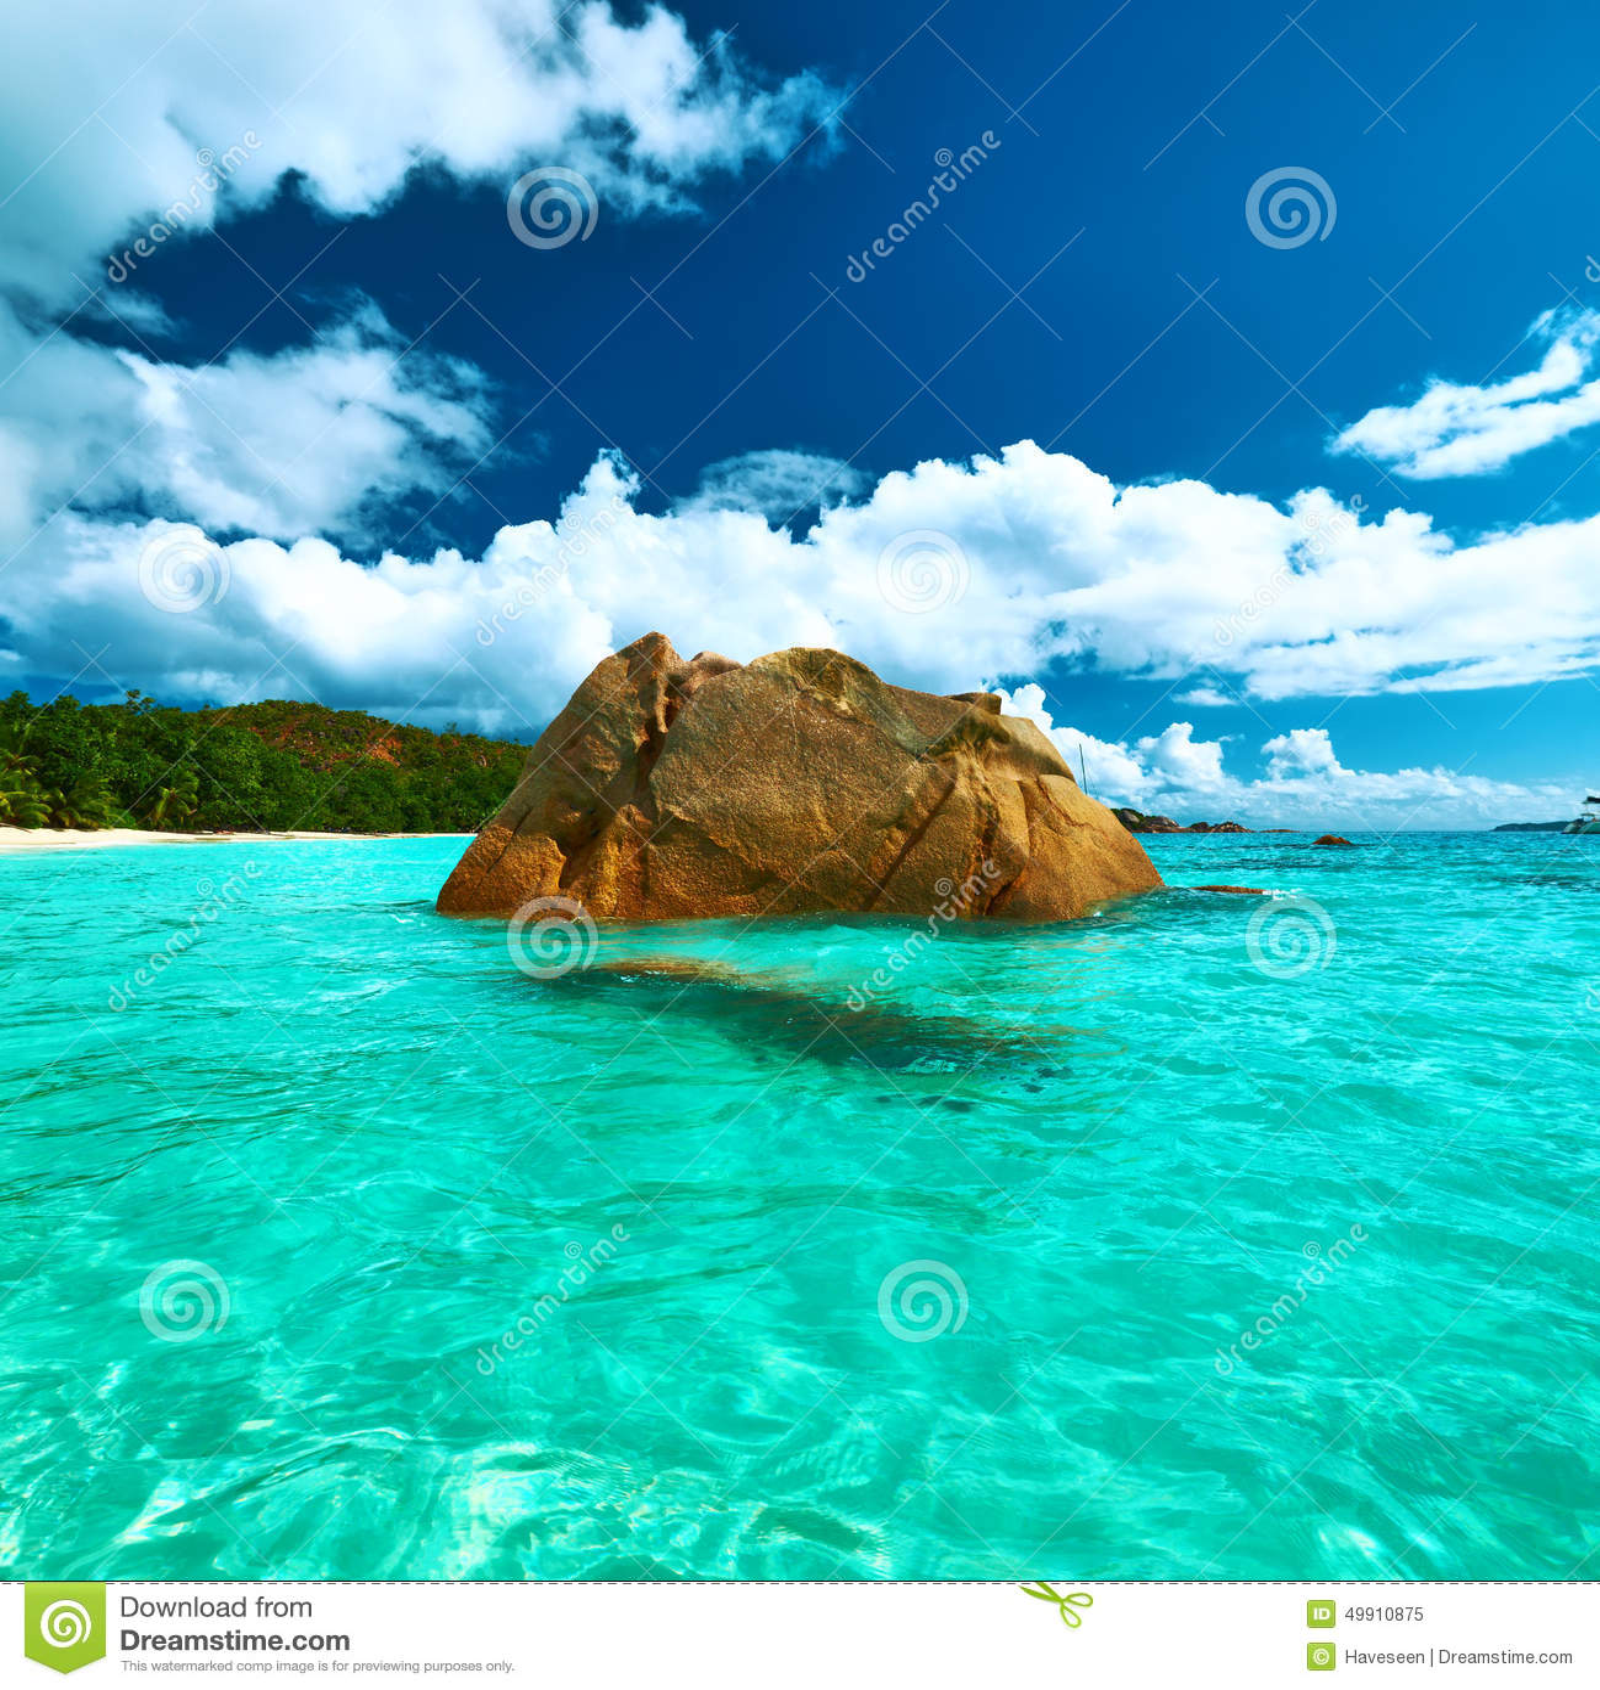 Seychelles Beach: Beautiful Beach At Seychelles Stock Image